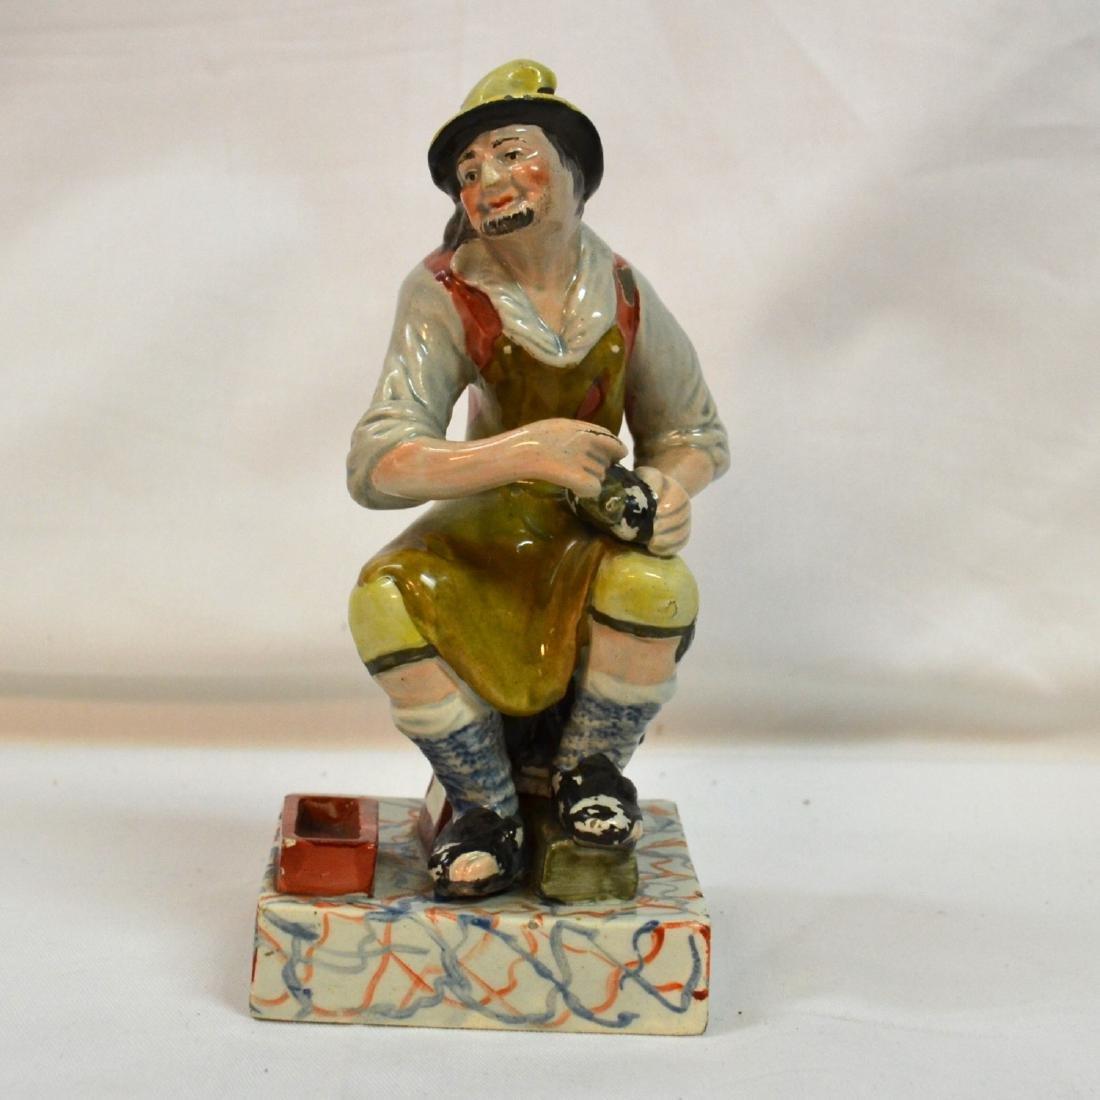 Vintage  Staffordshire Pottery Figure  Shoemaker